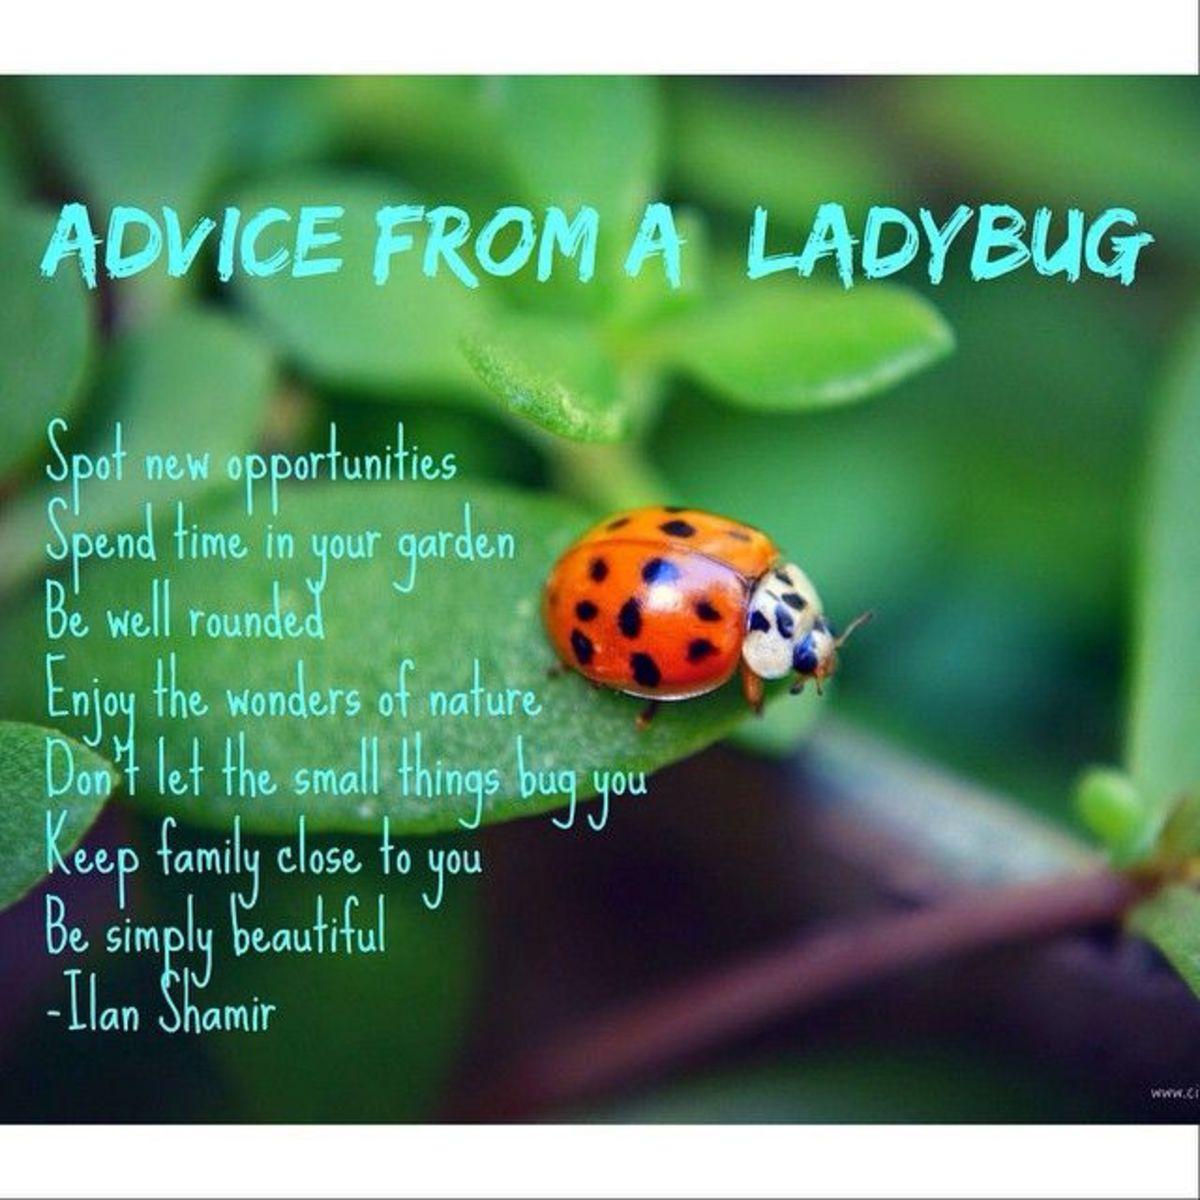 a-ladybug-of-culture